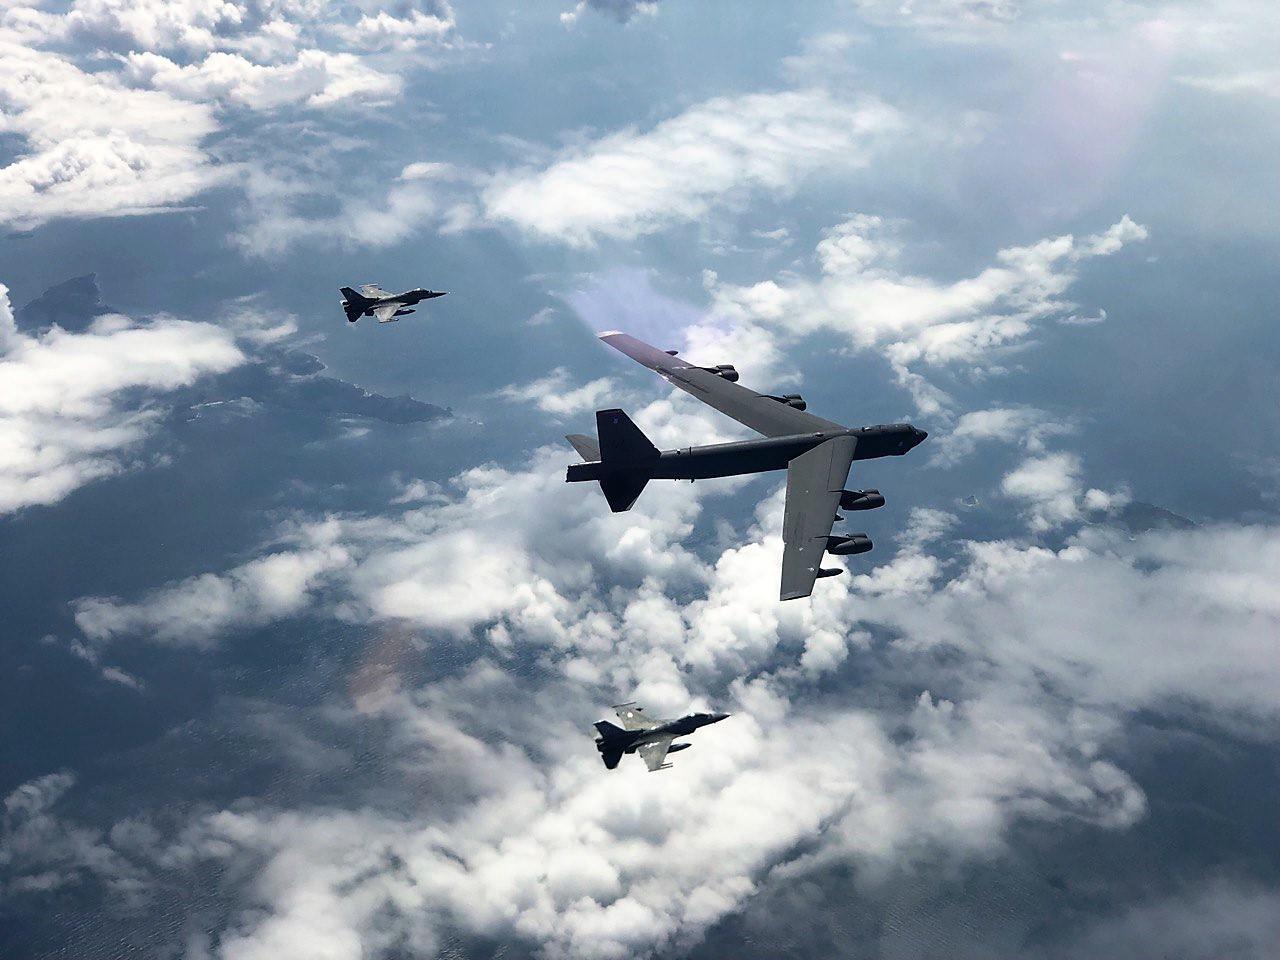 ellinika-f-16-petaxan-me-vomvardistiko-b-52-tis-usaf-eikones9